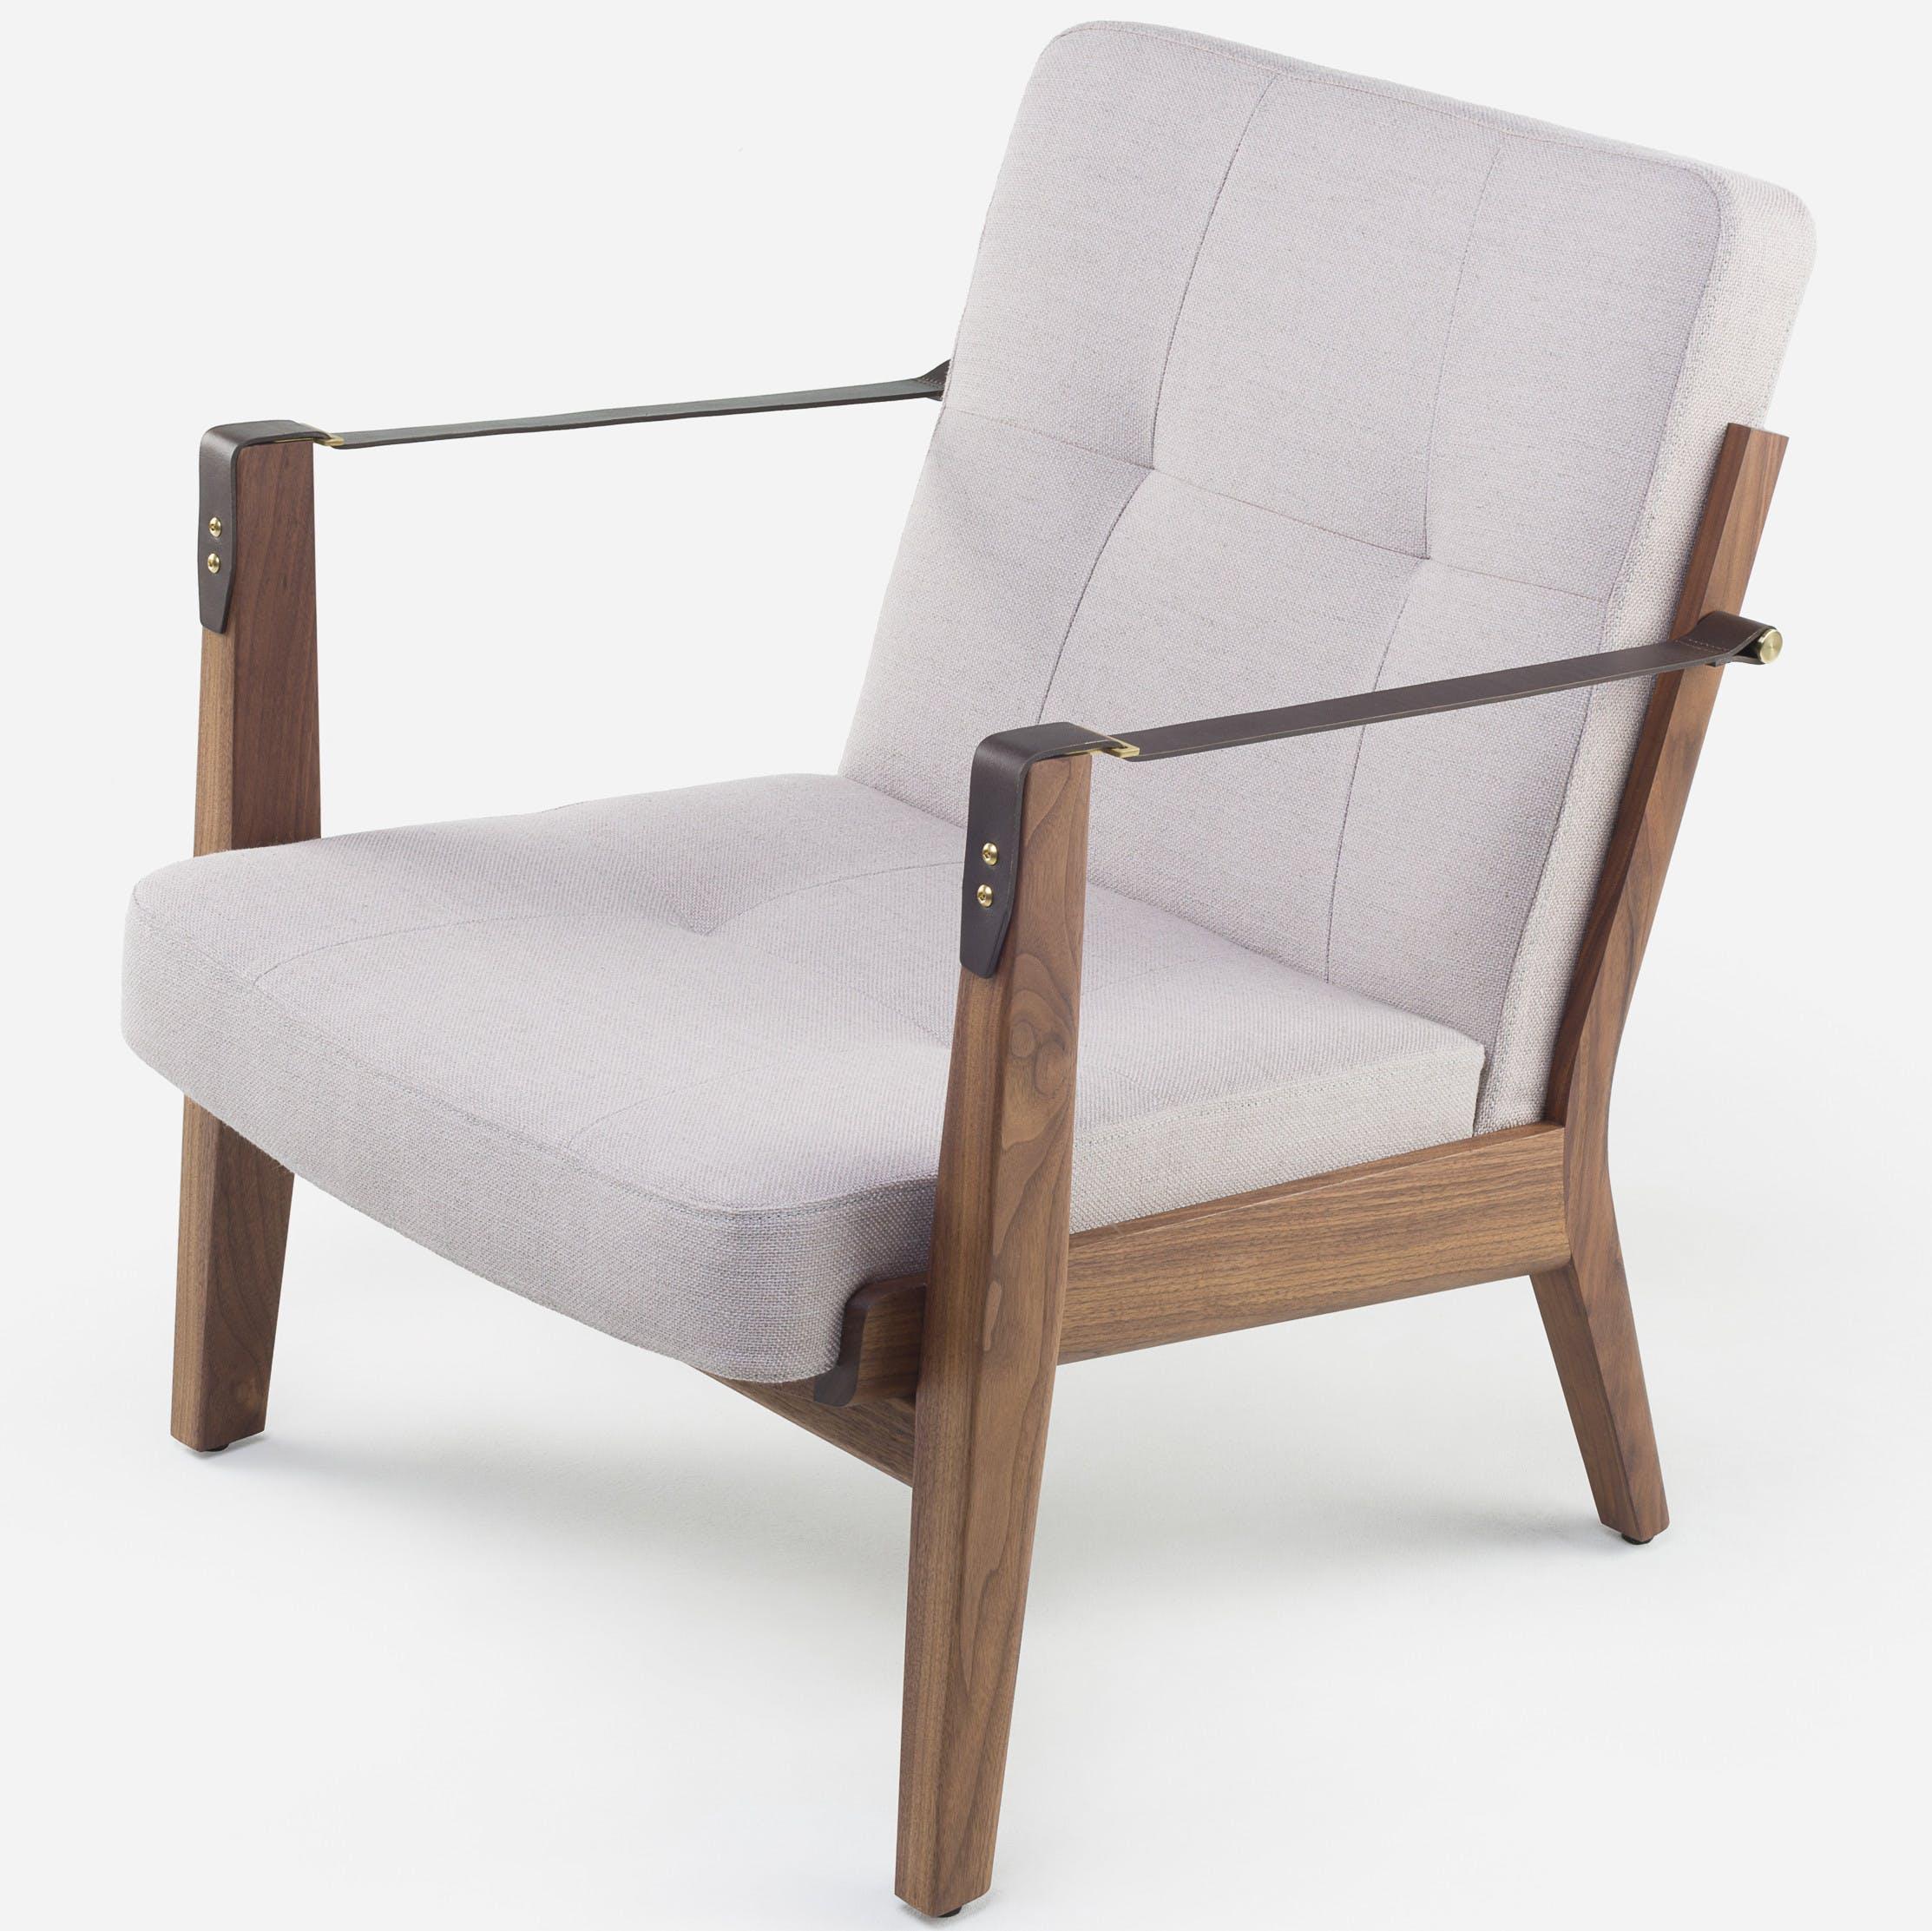 Capo Lounge Armchair By Nerihu 1